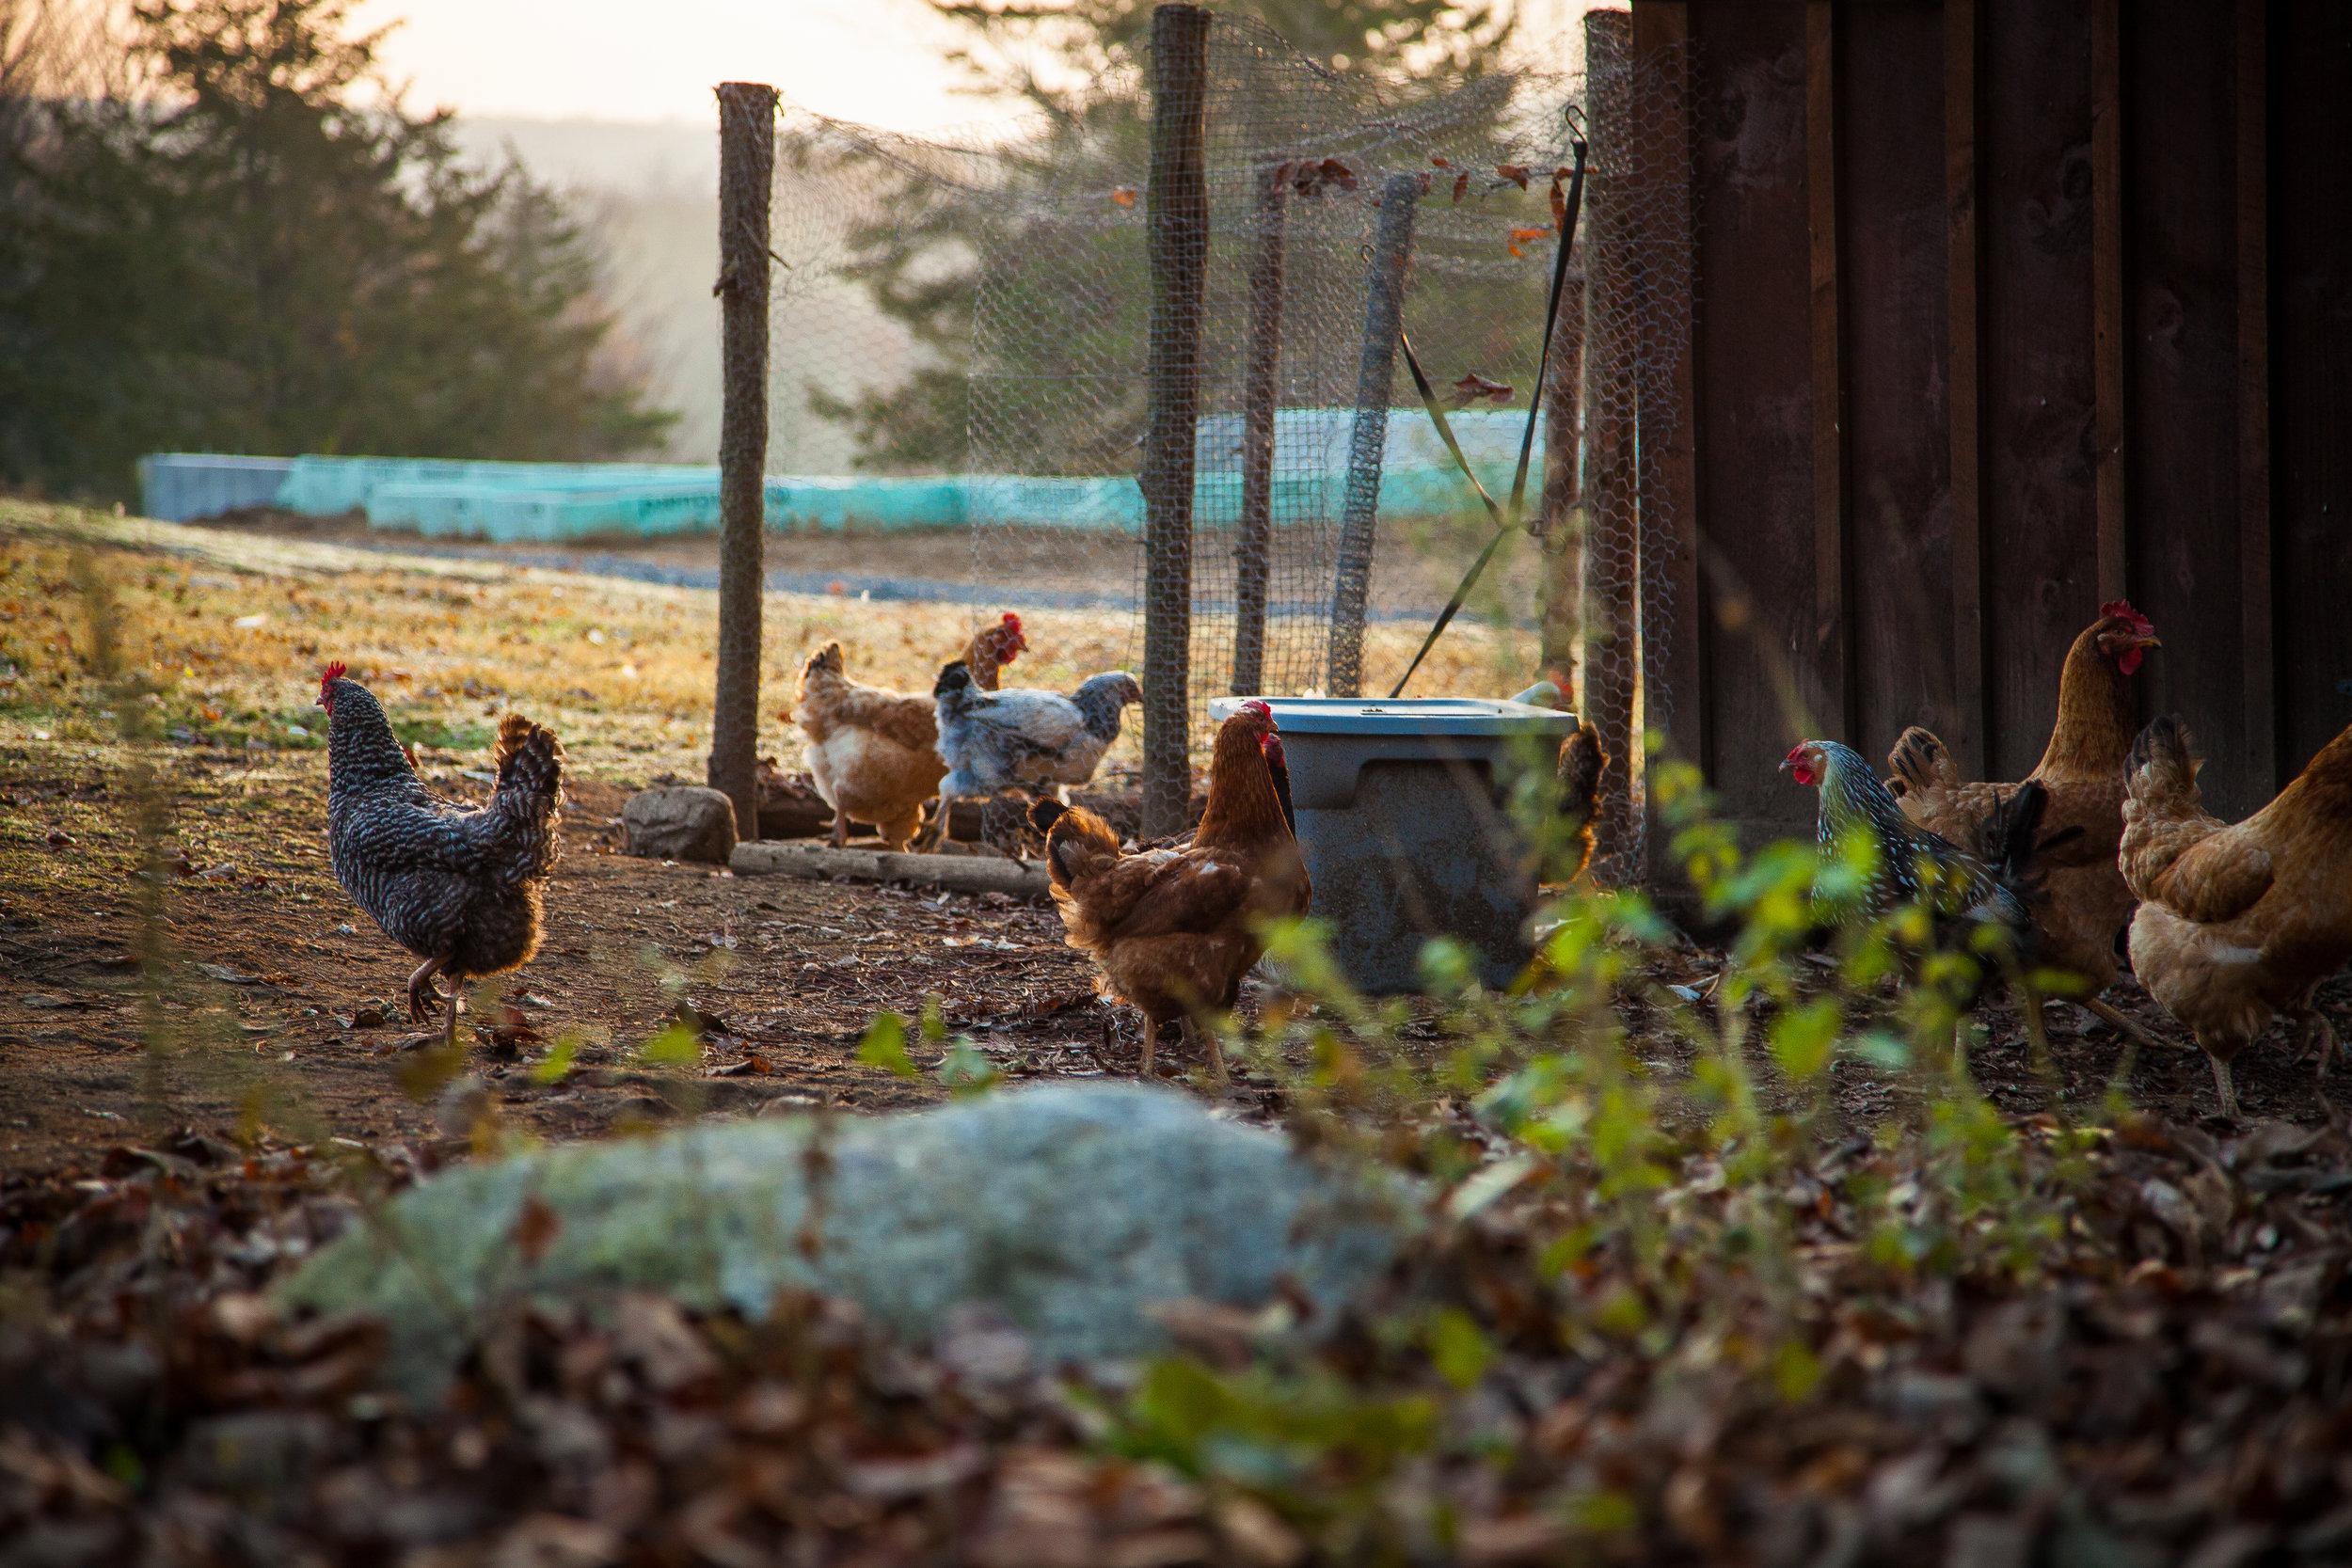 Stoneboat Farm, Lebanon CT (Carla McElroy Photography 2017)